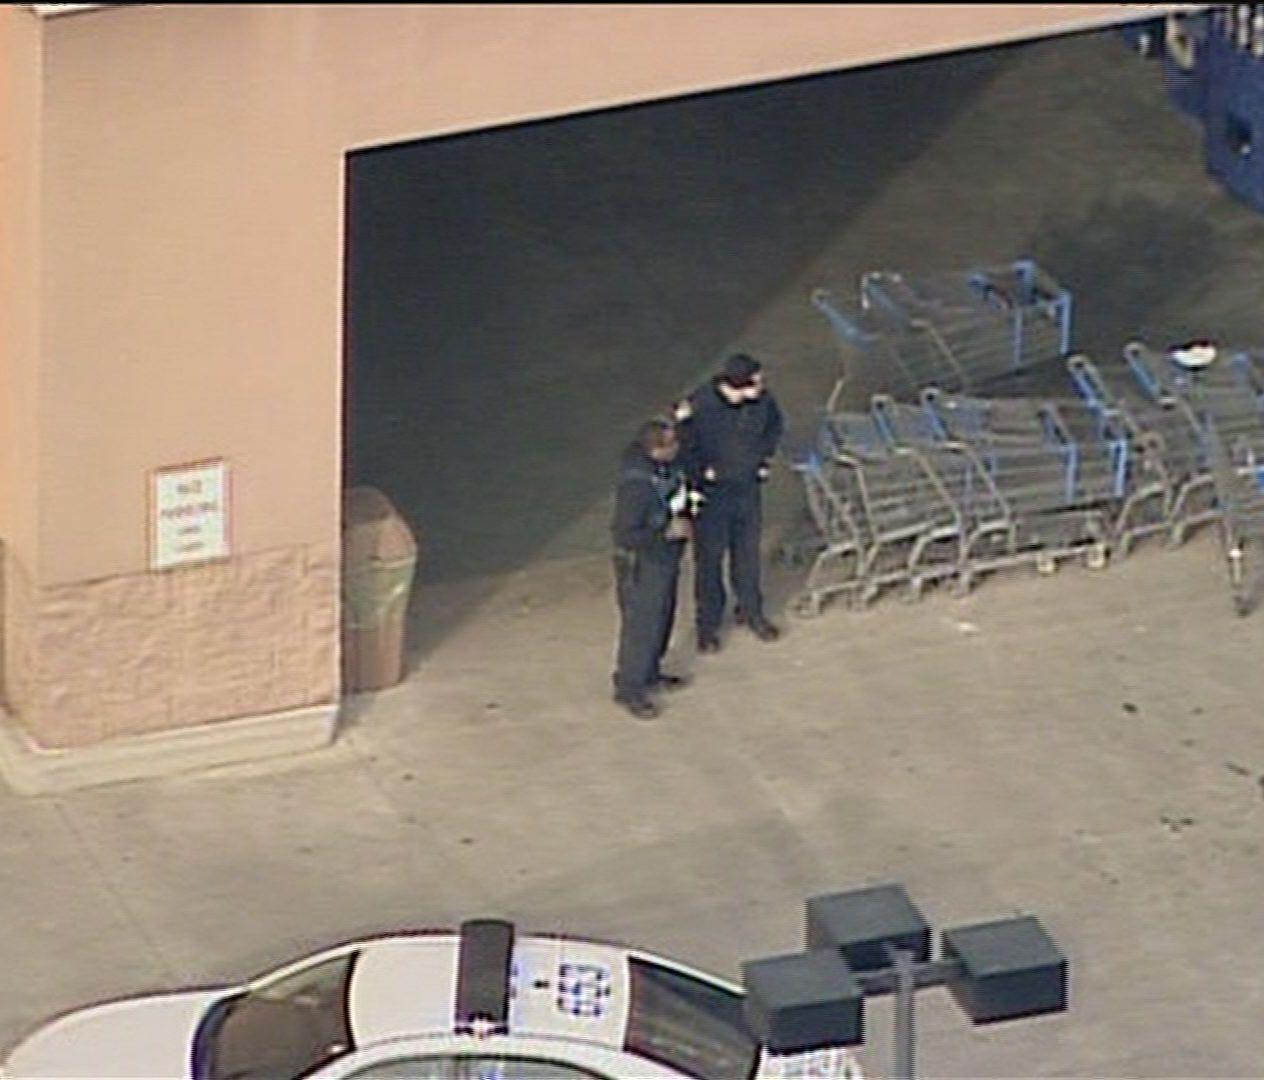 Shoplifter Accidentally Shoots Himself Inside Walmart